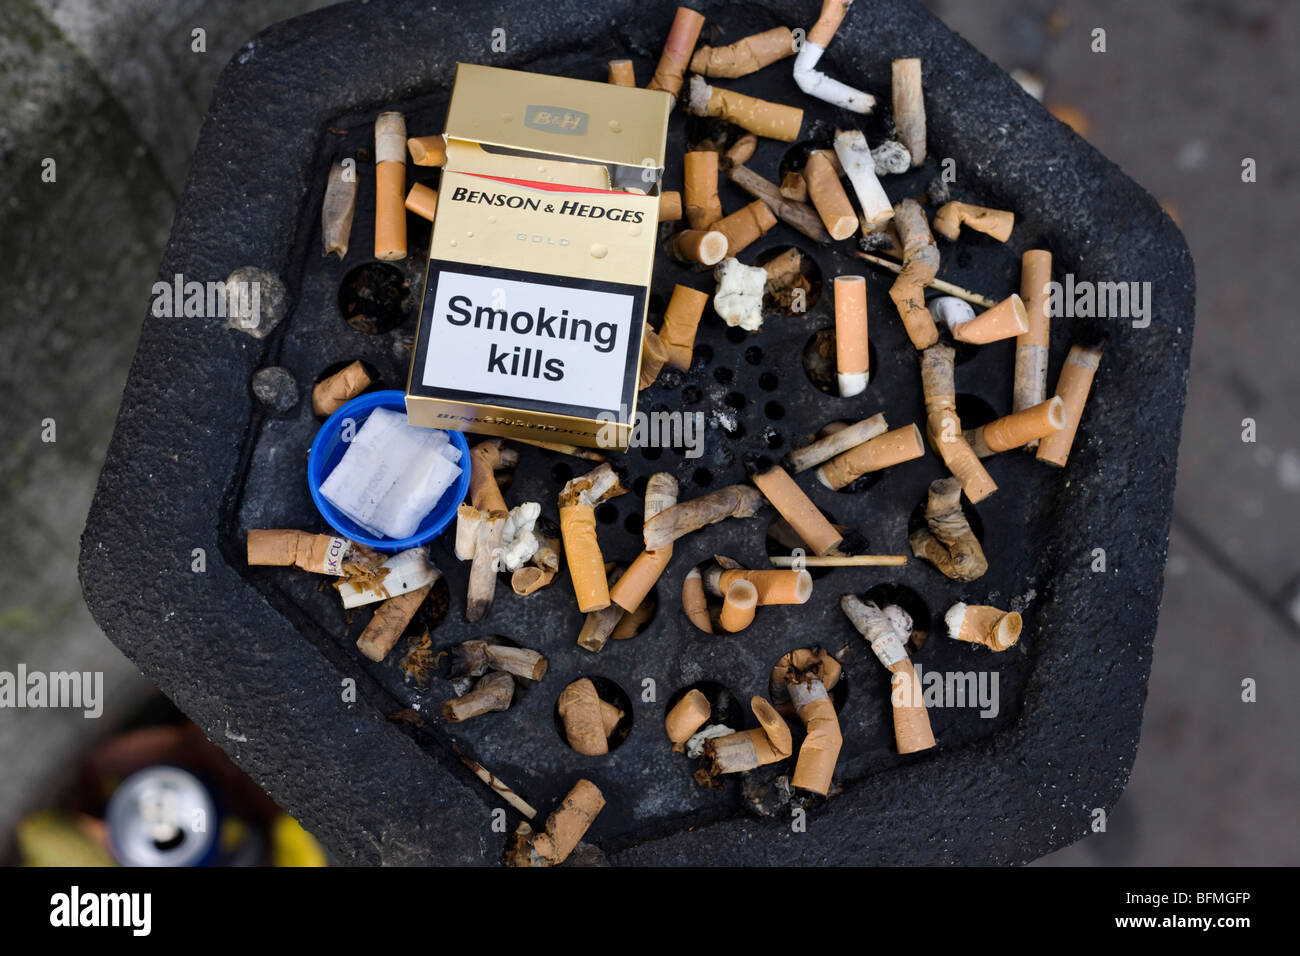 Buy Kool cigarettes New Jersey